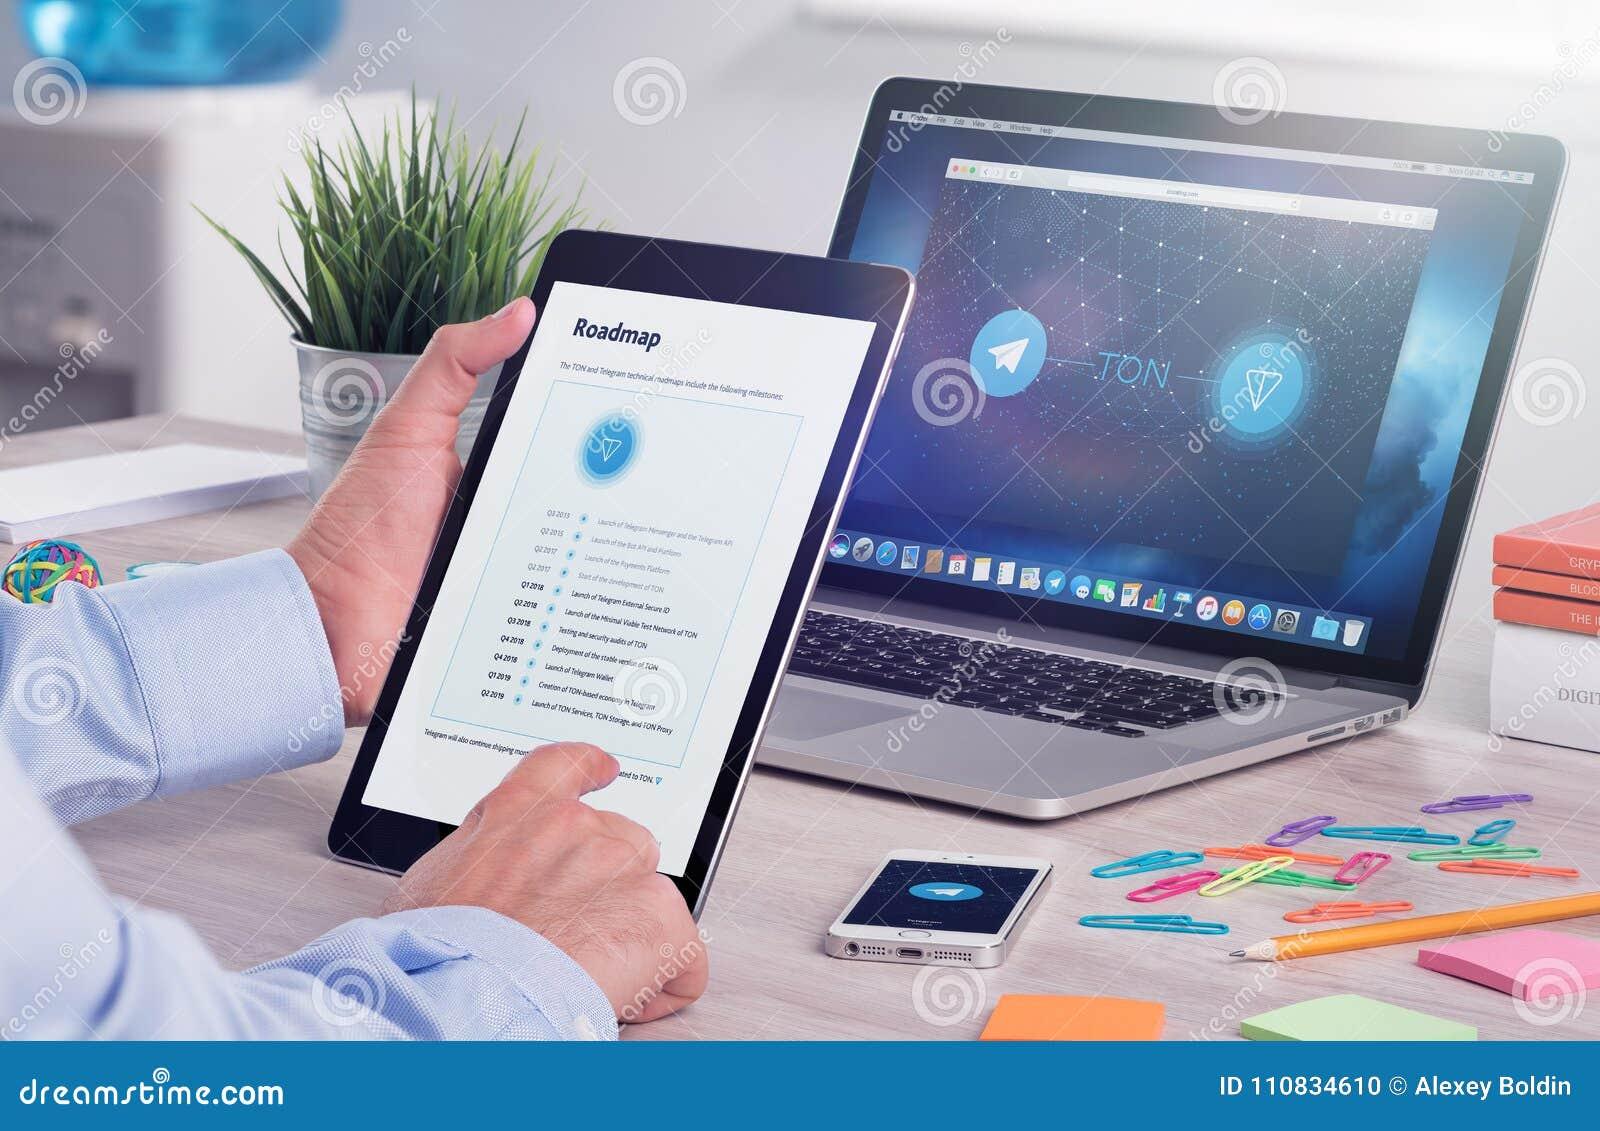 ICO Investor reads Telegram Open Network TON white paper roadmap on the iPad screen